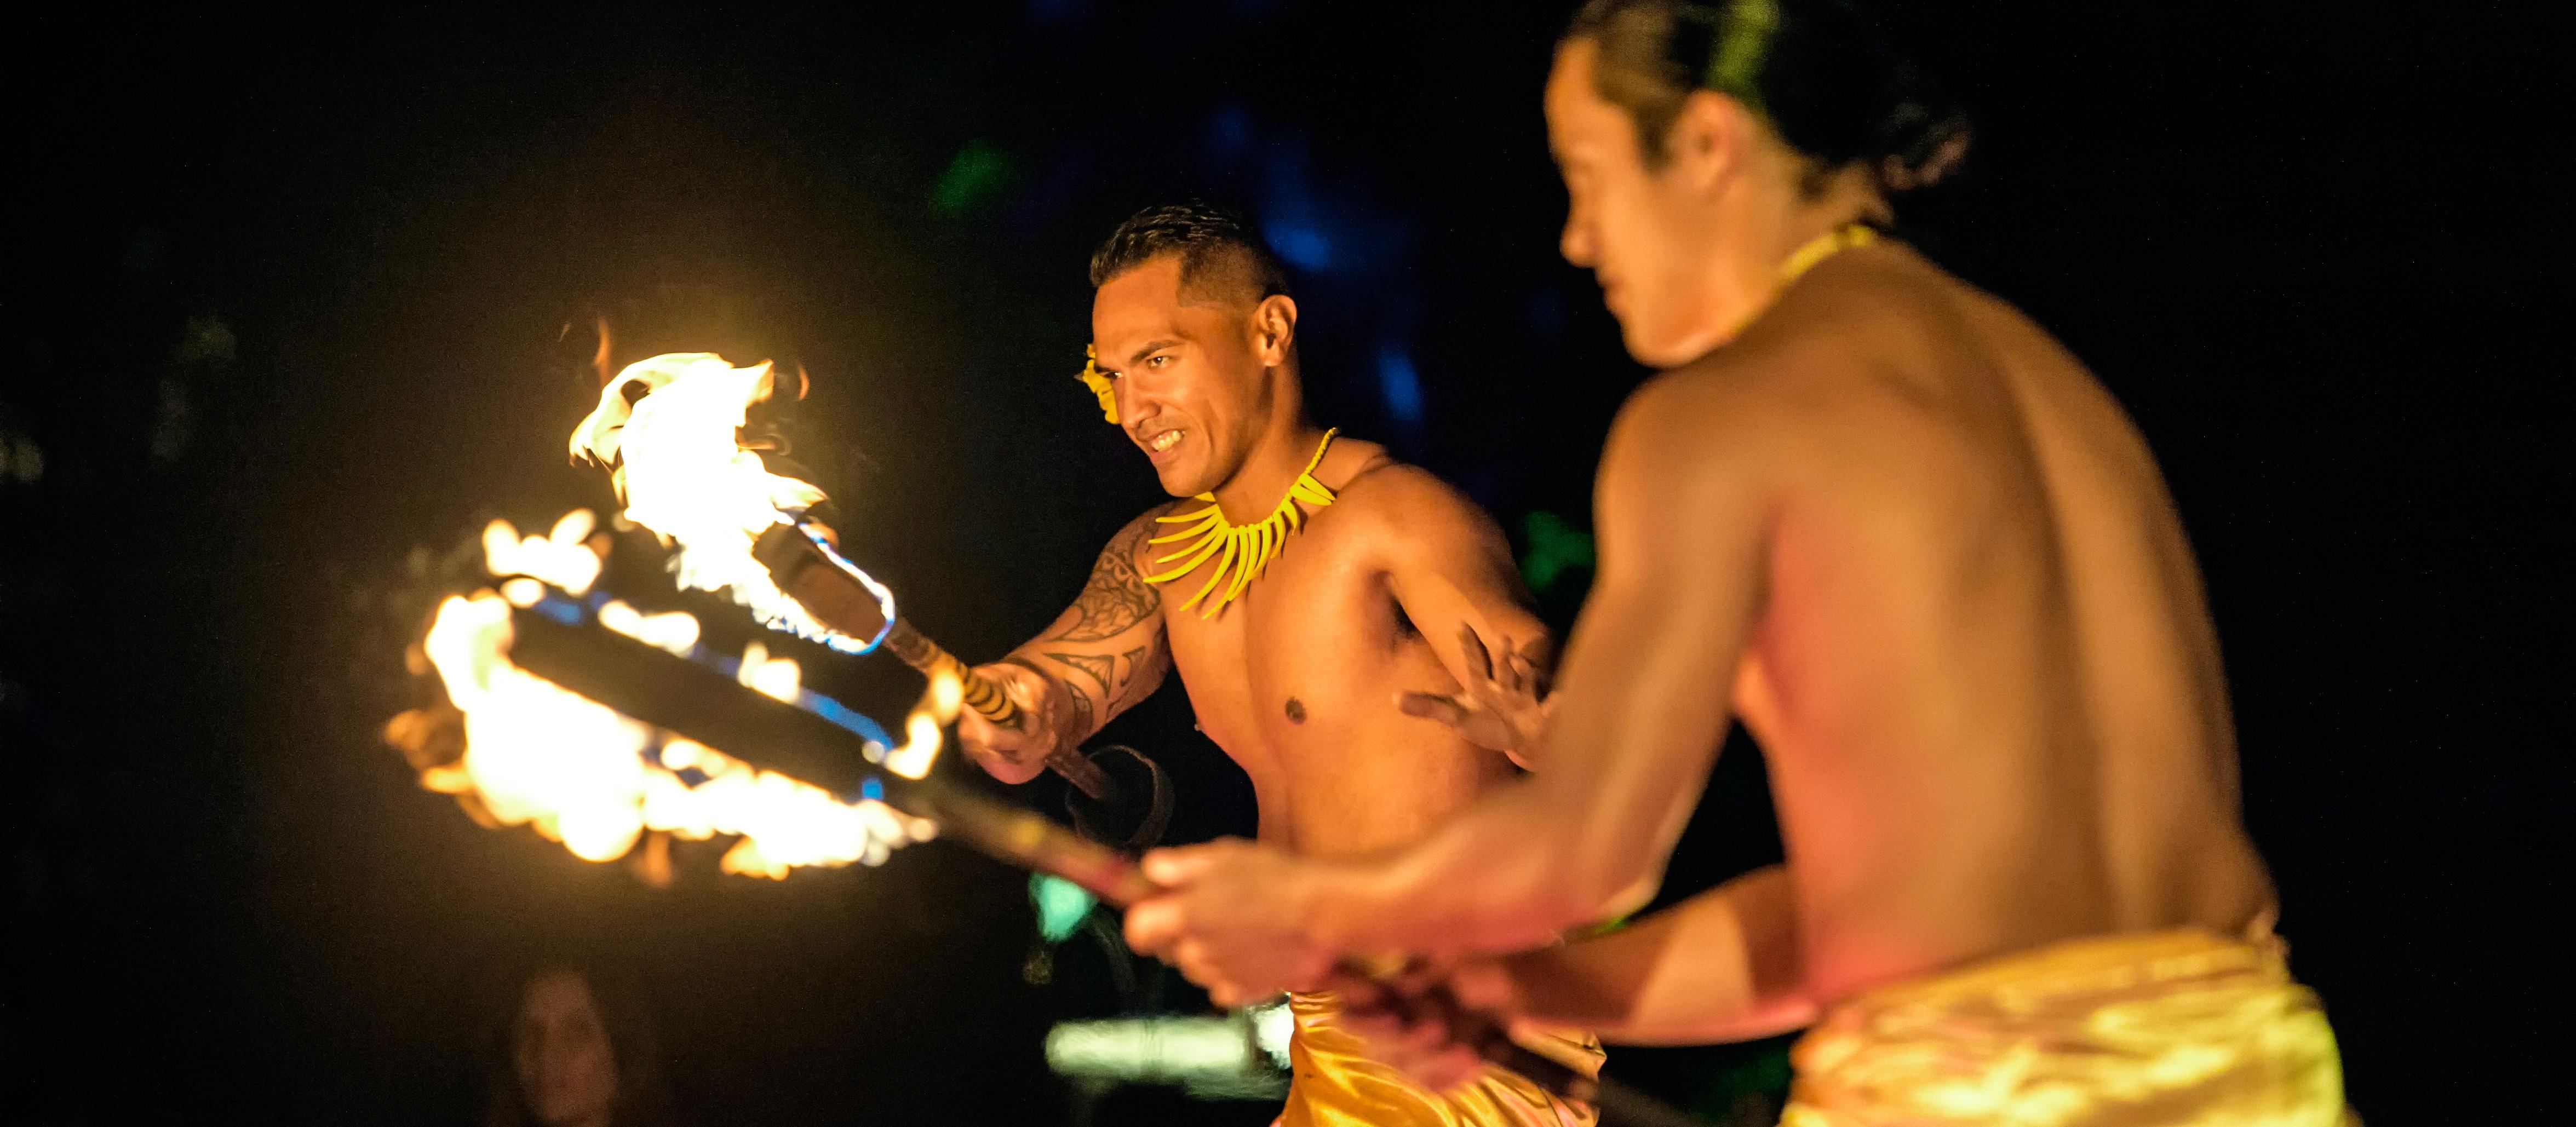 Two Hawaiian men in shiny wraps perform a traditional fire dance for Ka Wa'a Luau guests.